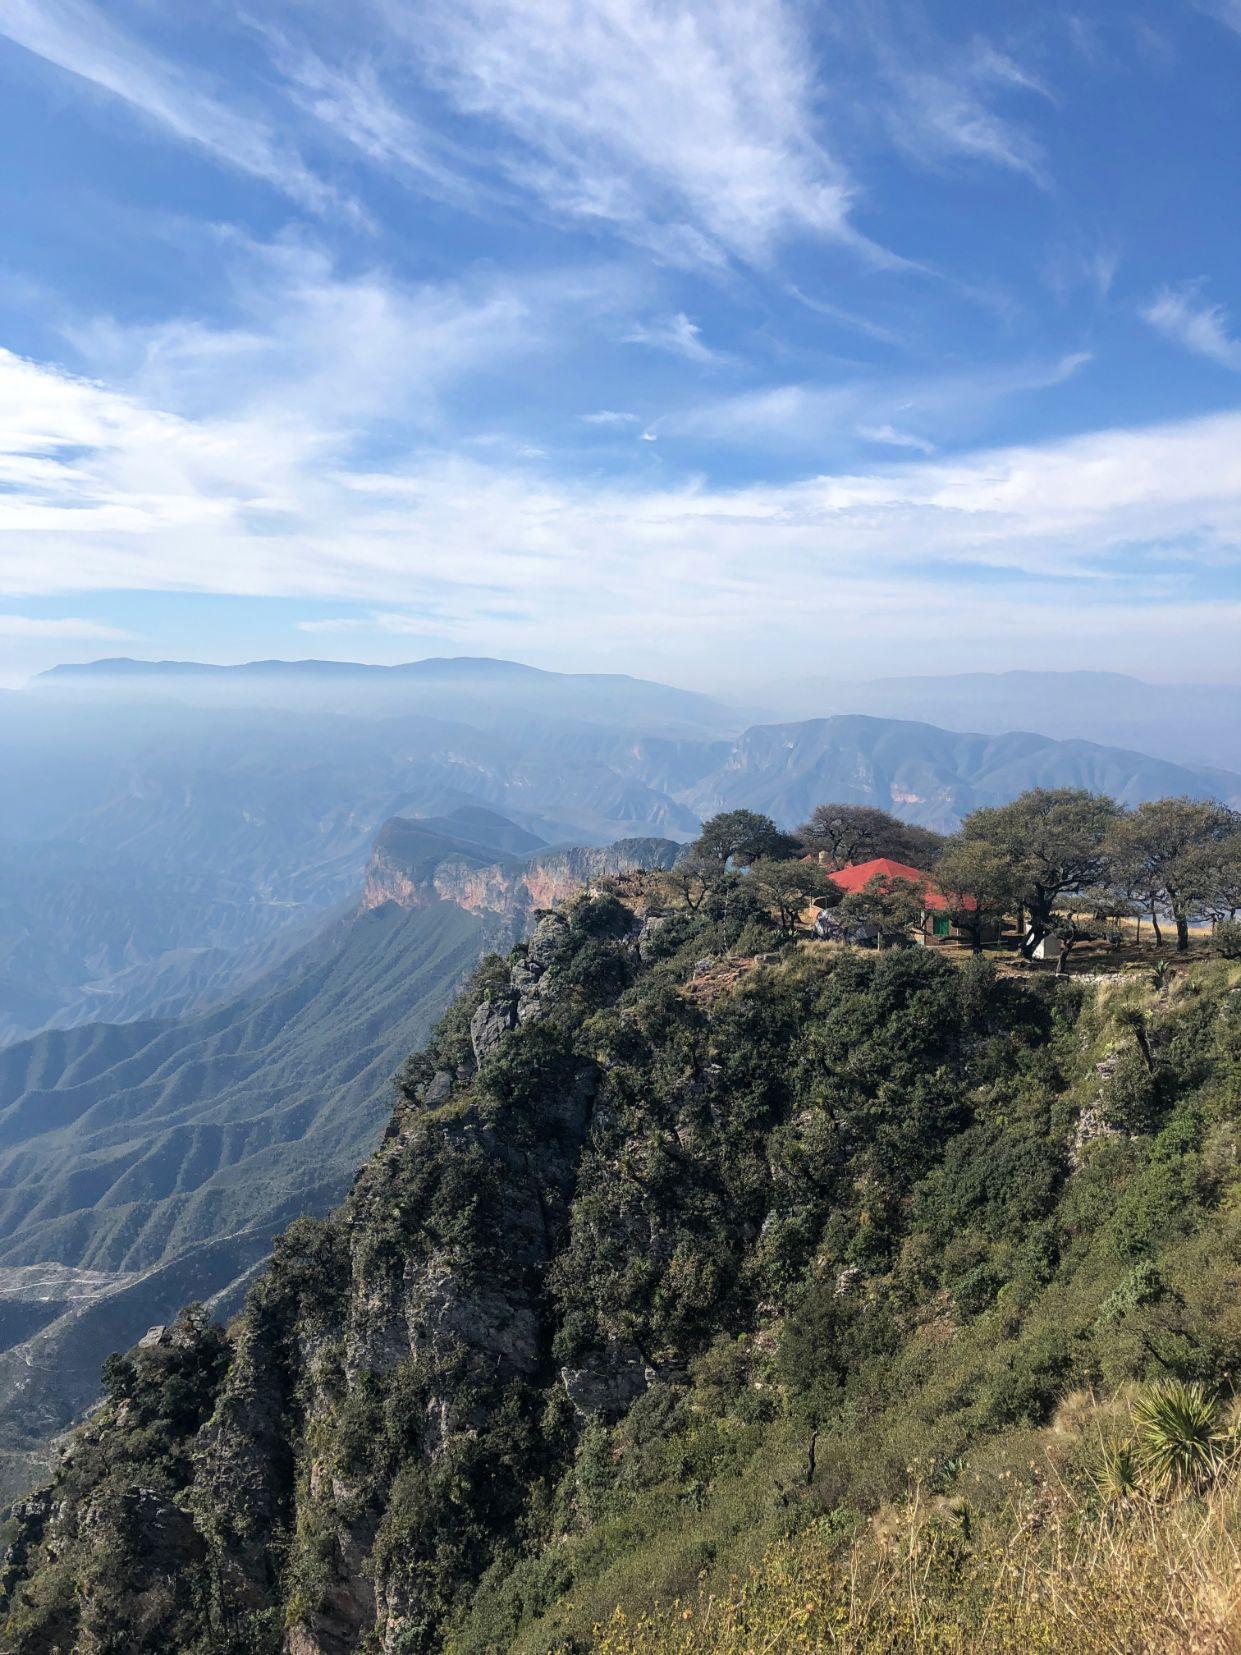 hiking to the Mirador de Cuatro Pelos viewpoint